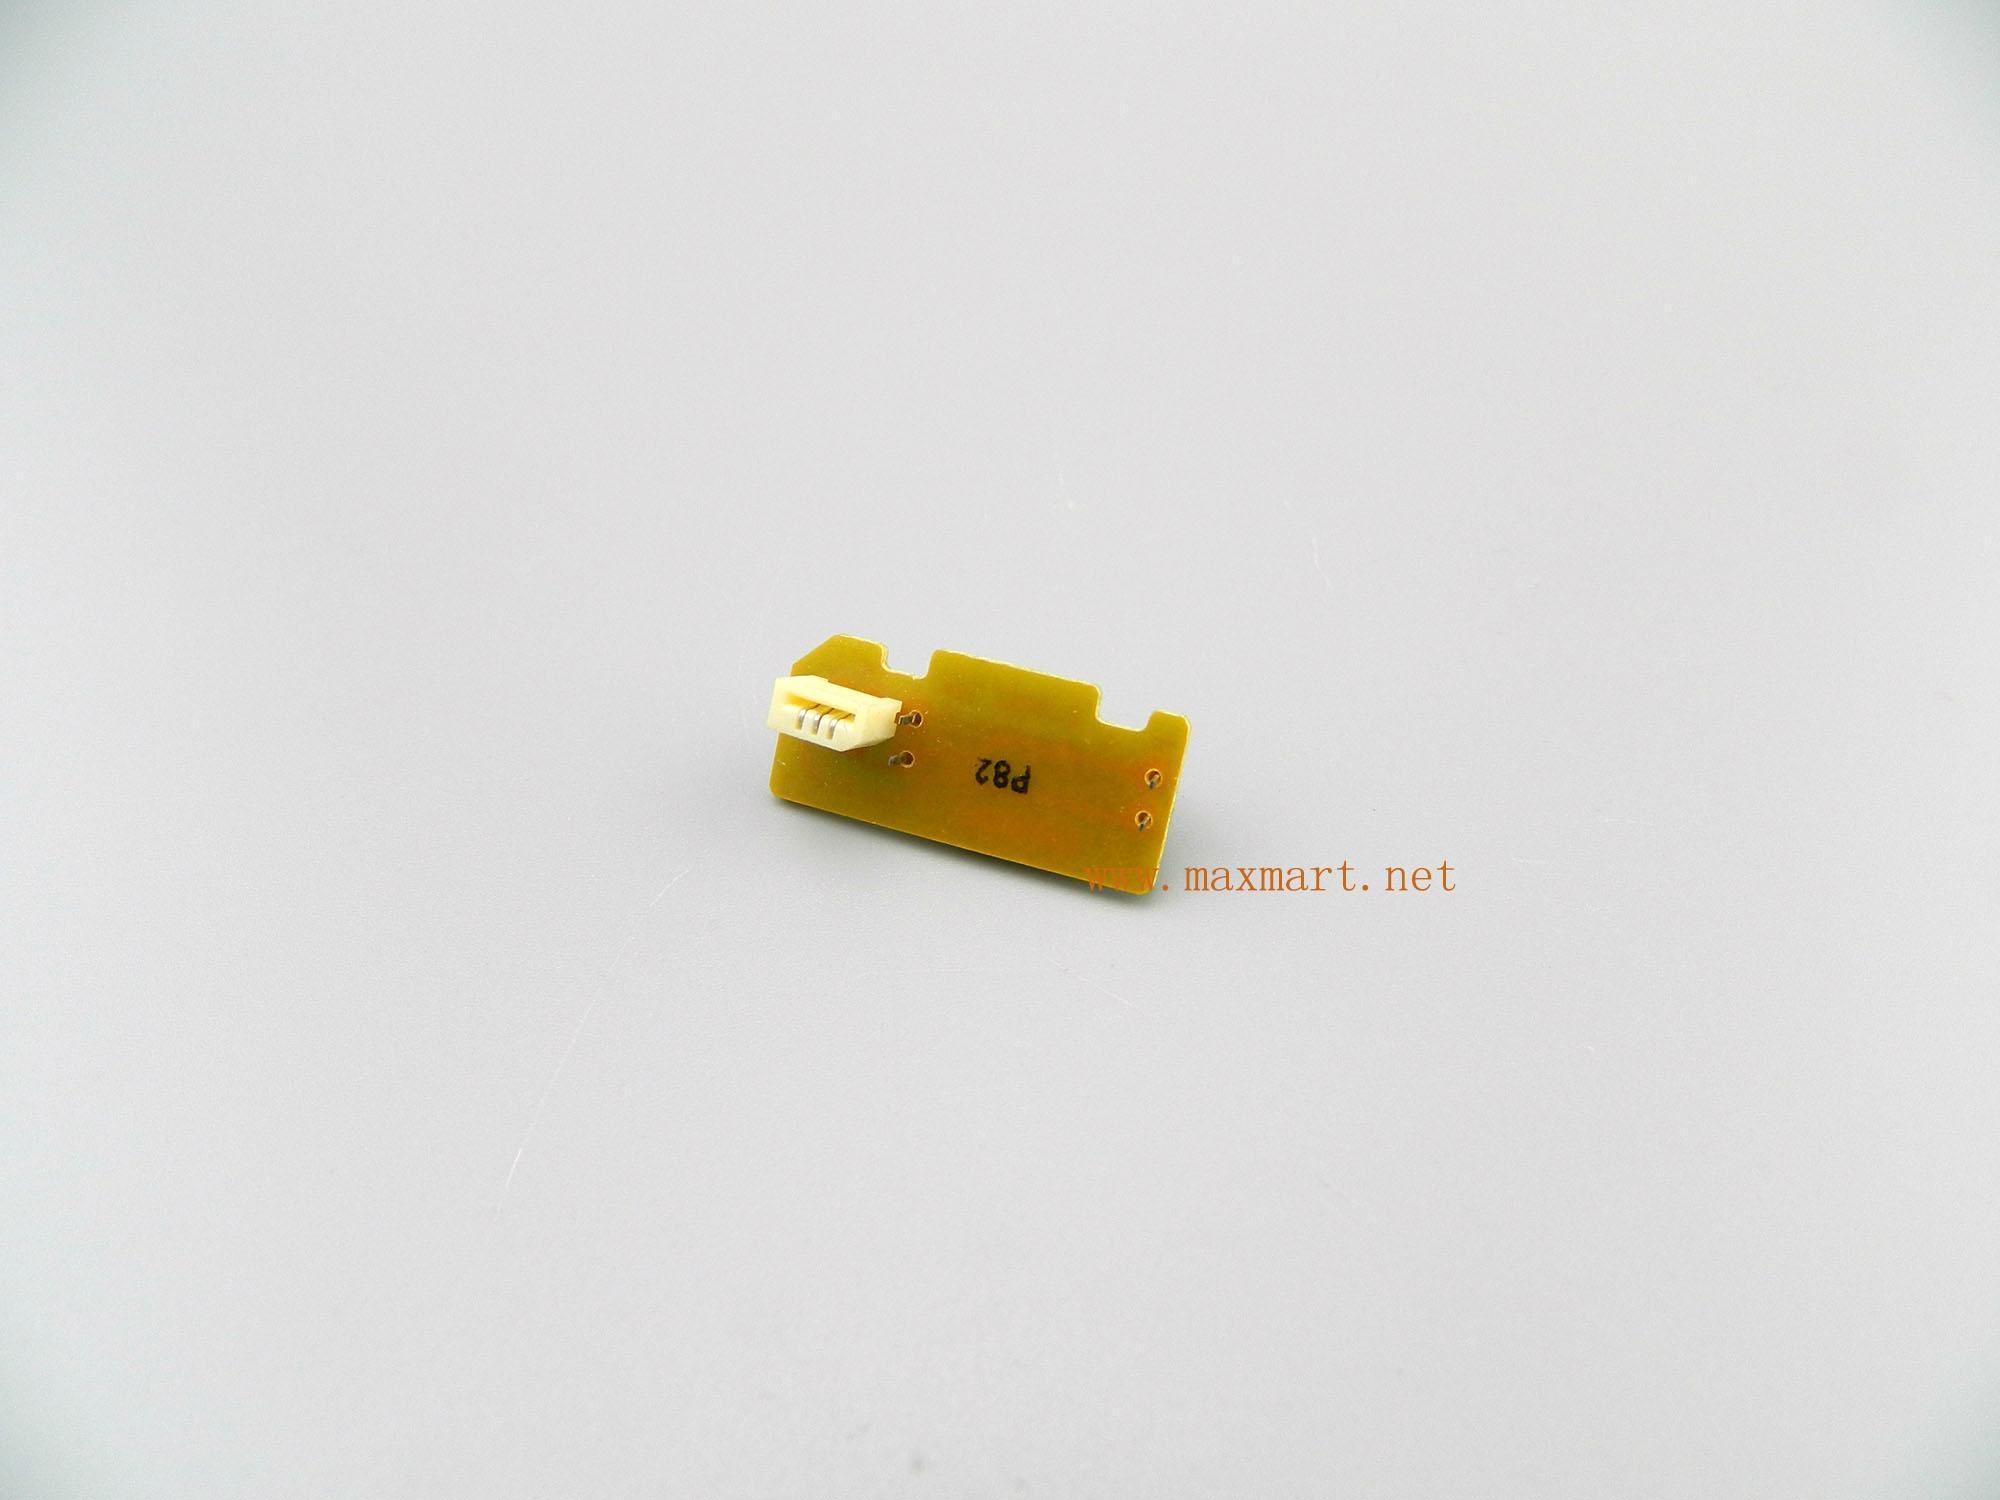 Paper feed sensor for Epson Stylus Pro 7800 9800 7880 9880